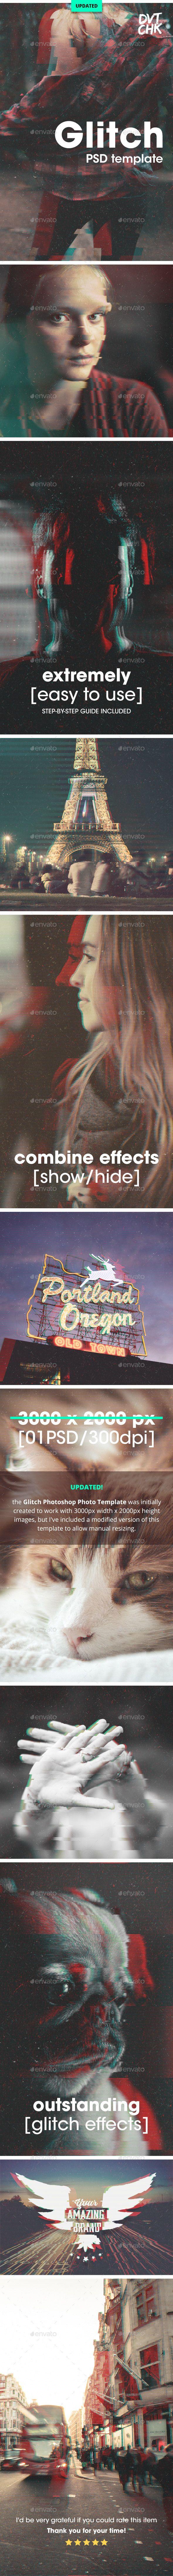 Glitch Photoshop Photo Template – Tech / Futuristic Photo Templates